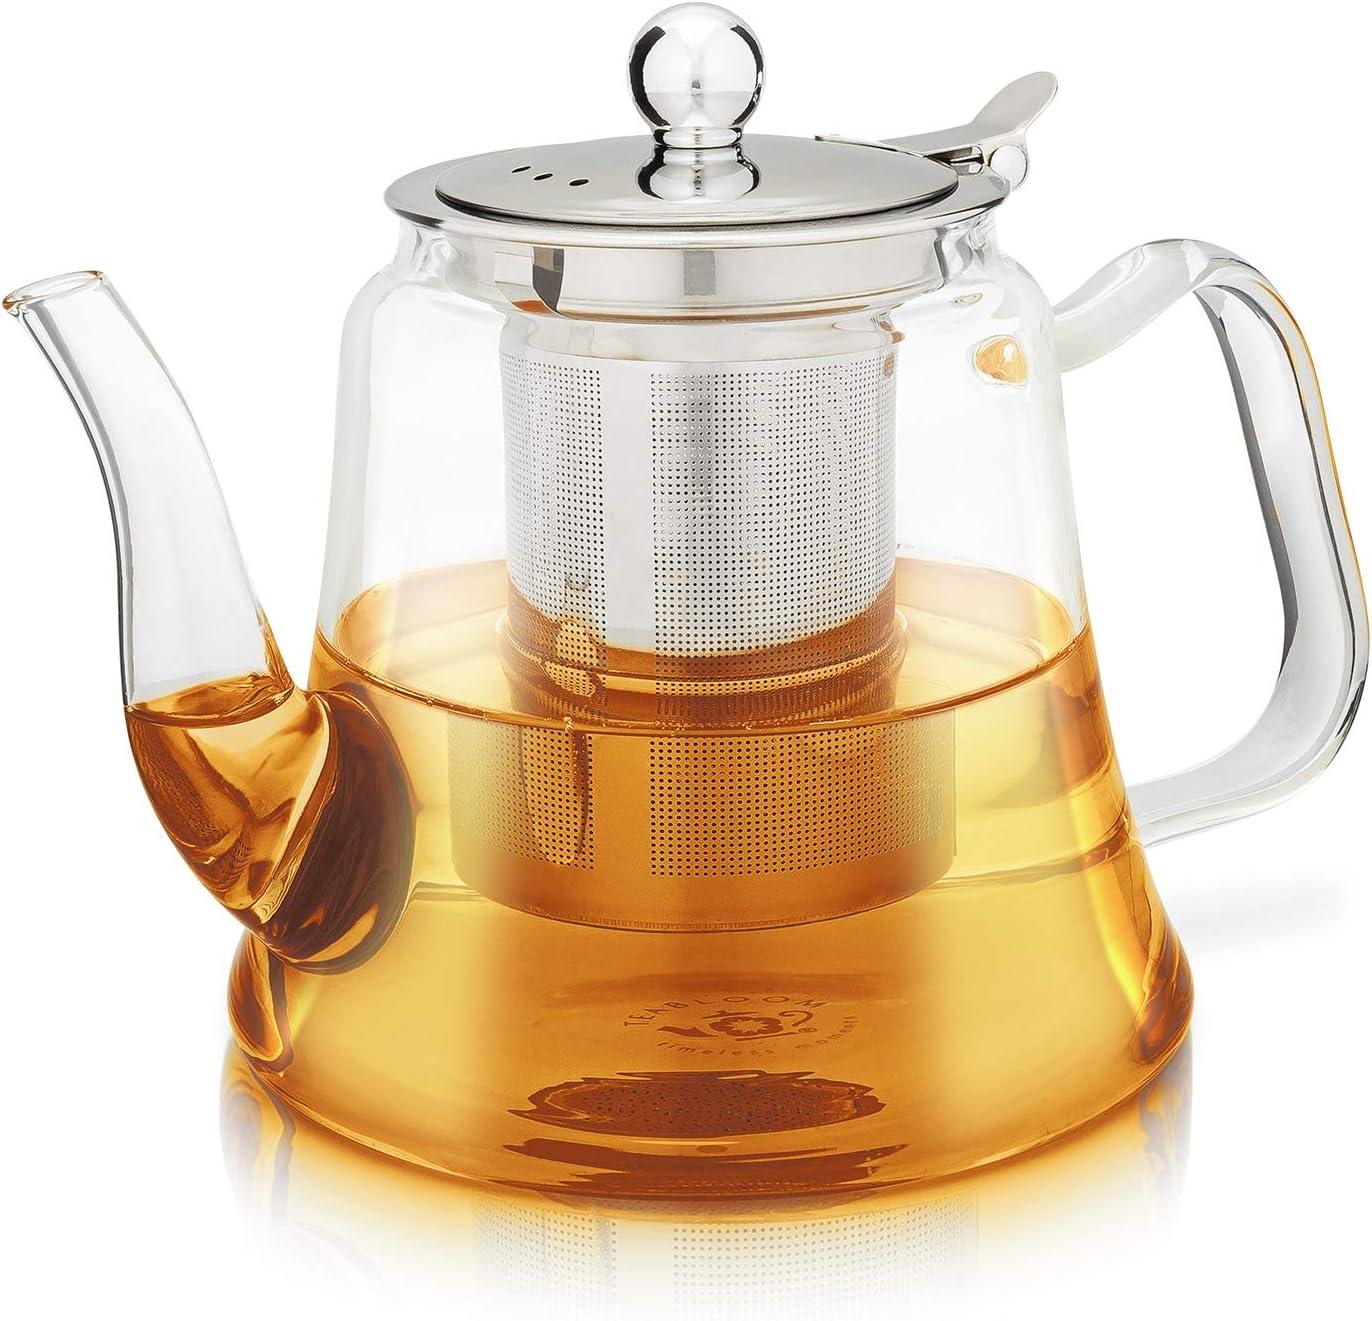 Teabloom Siena Teapot – Premium Borosilicate Glass Teapot with Removable Loose Tea Infuser – Stovetop Safe – Tea